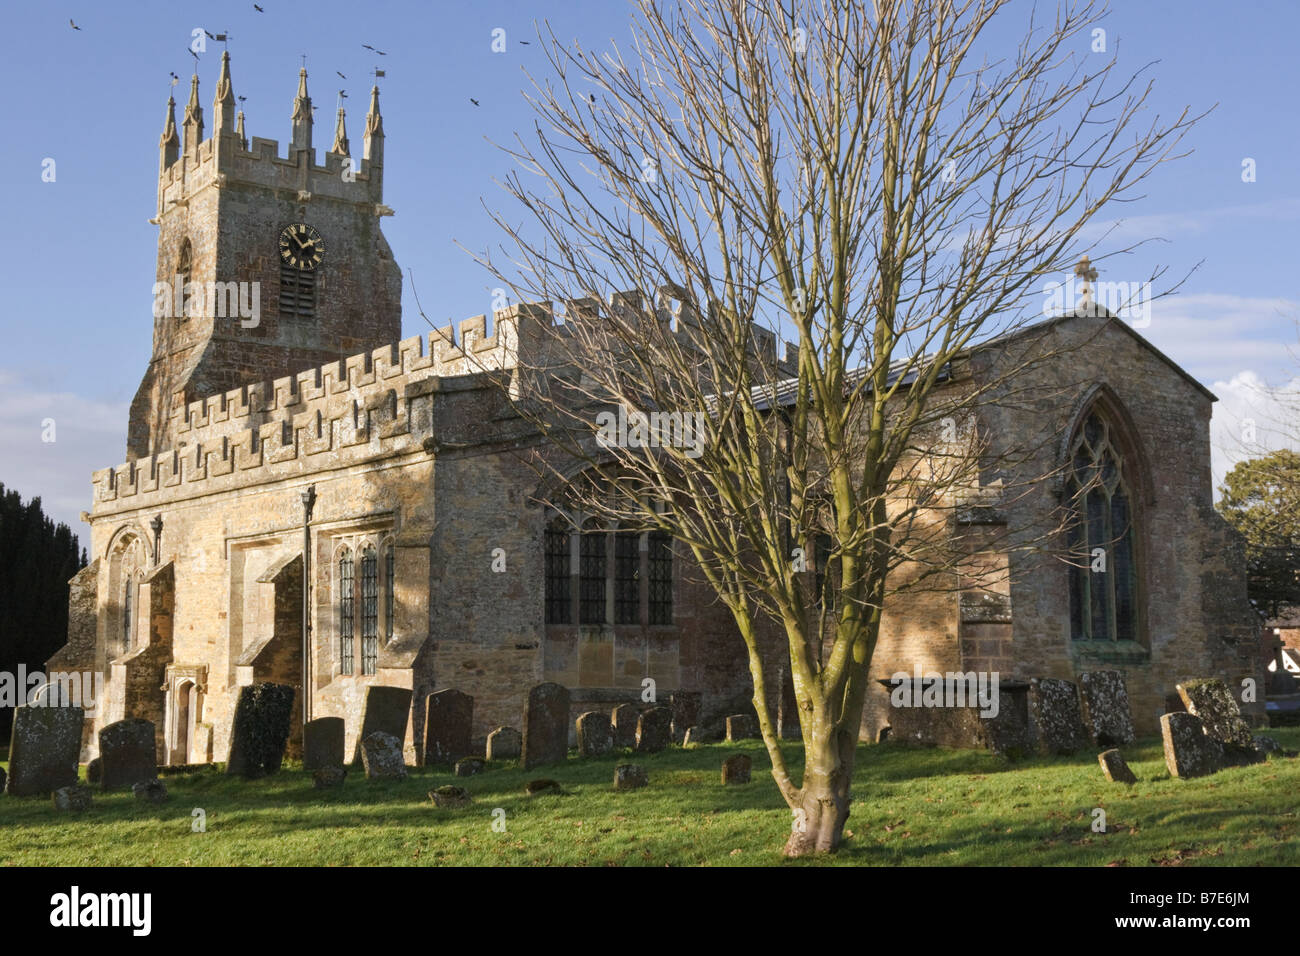 St James's church Somerton Oxfordshire England UK - Stock Image